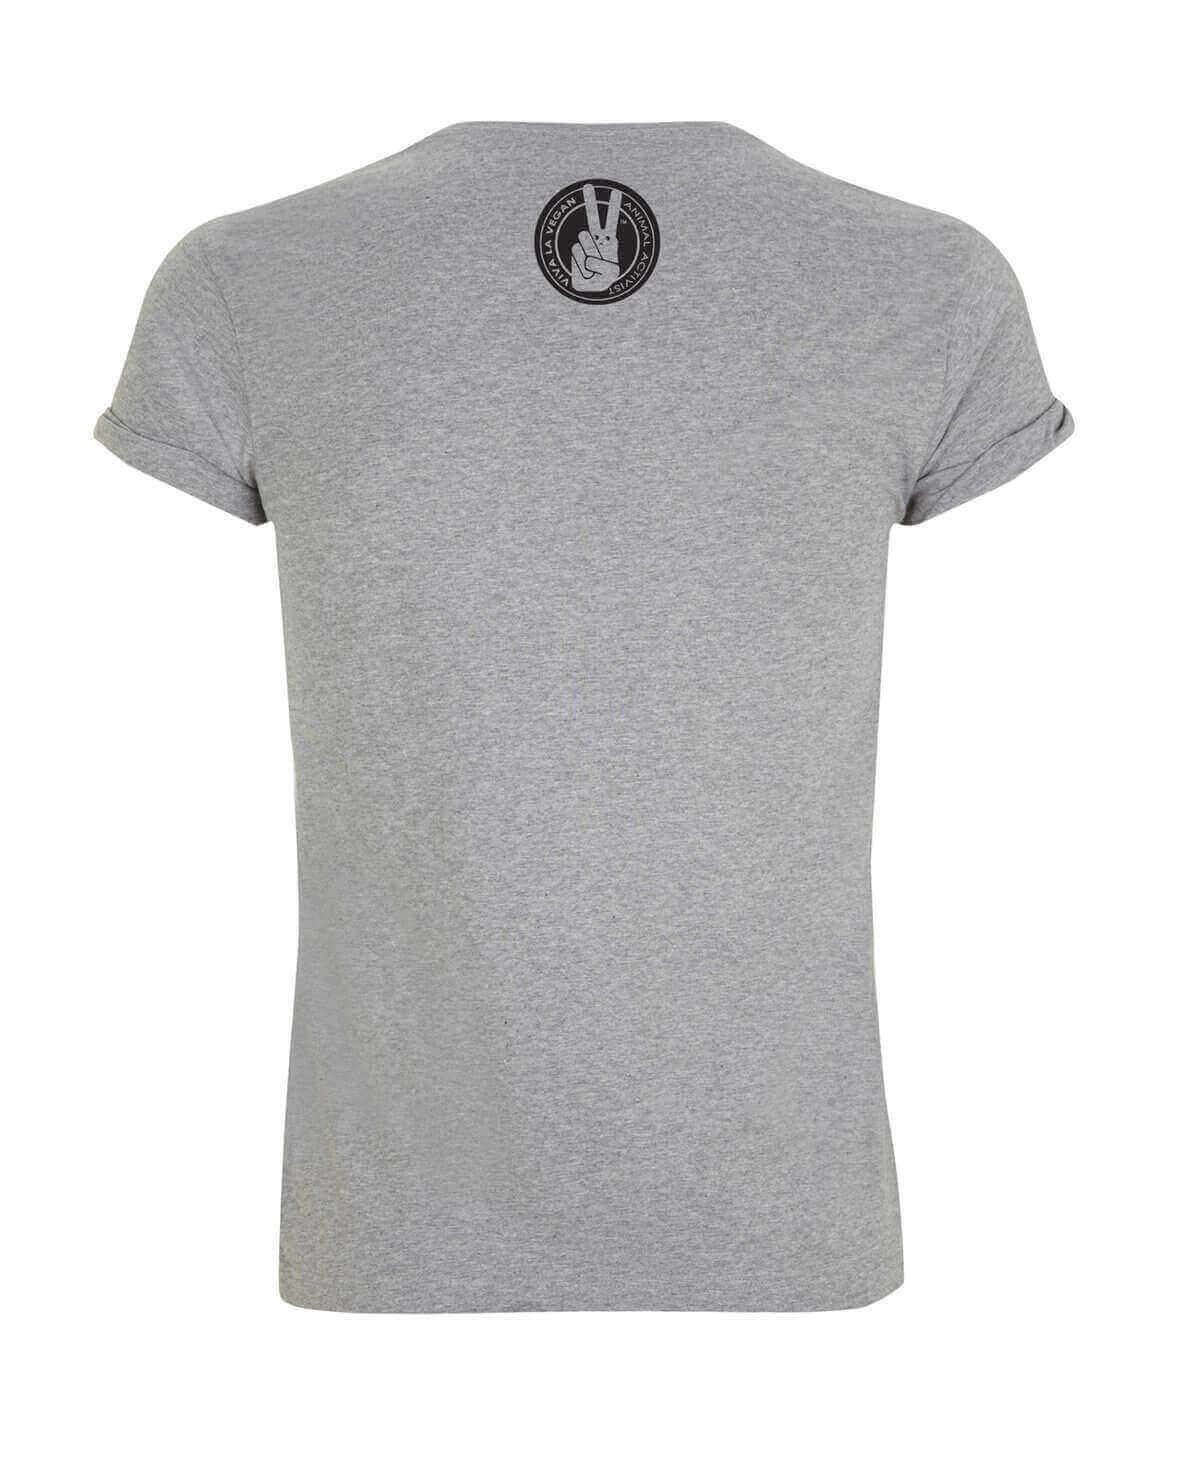 Unisex Tshirt : Vegan for life - Not for likes GREY MARL